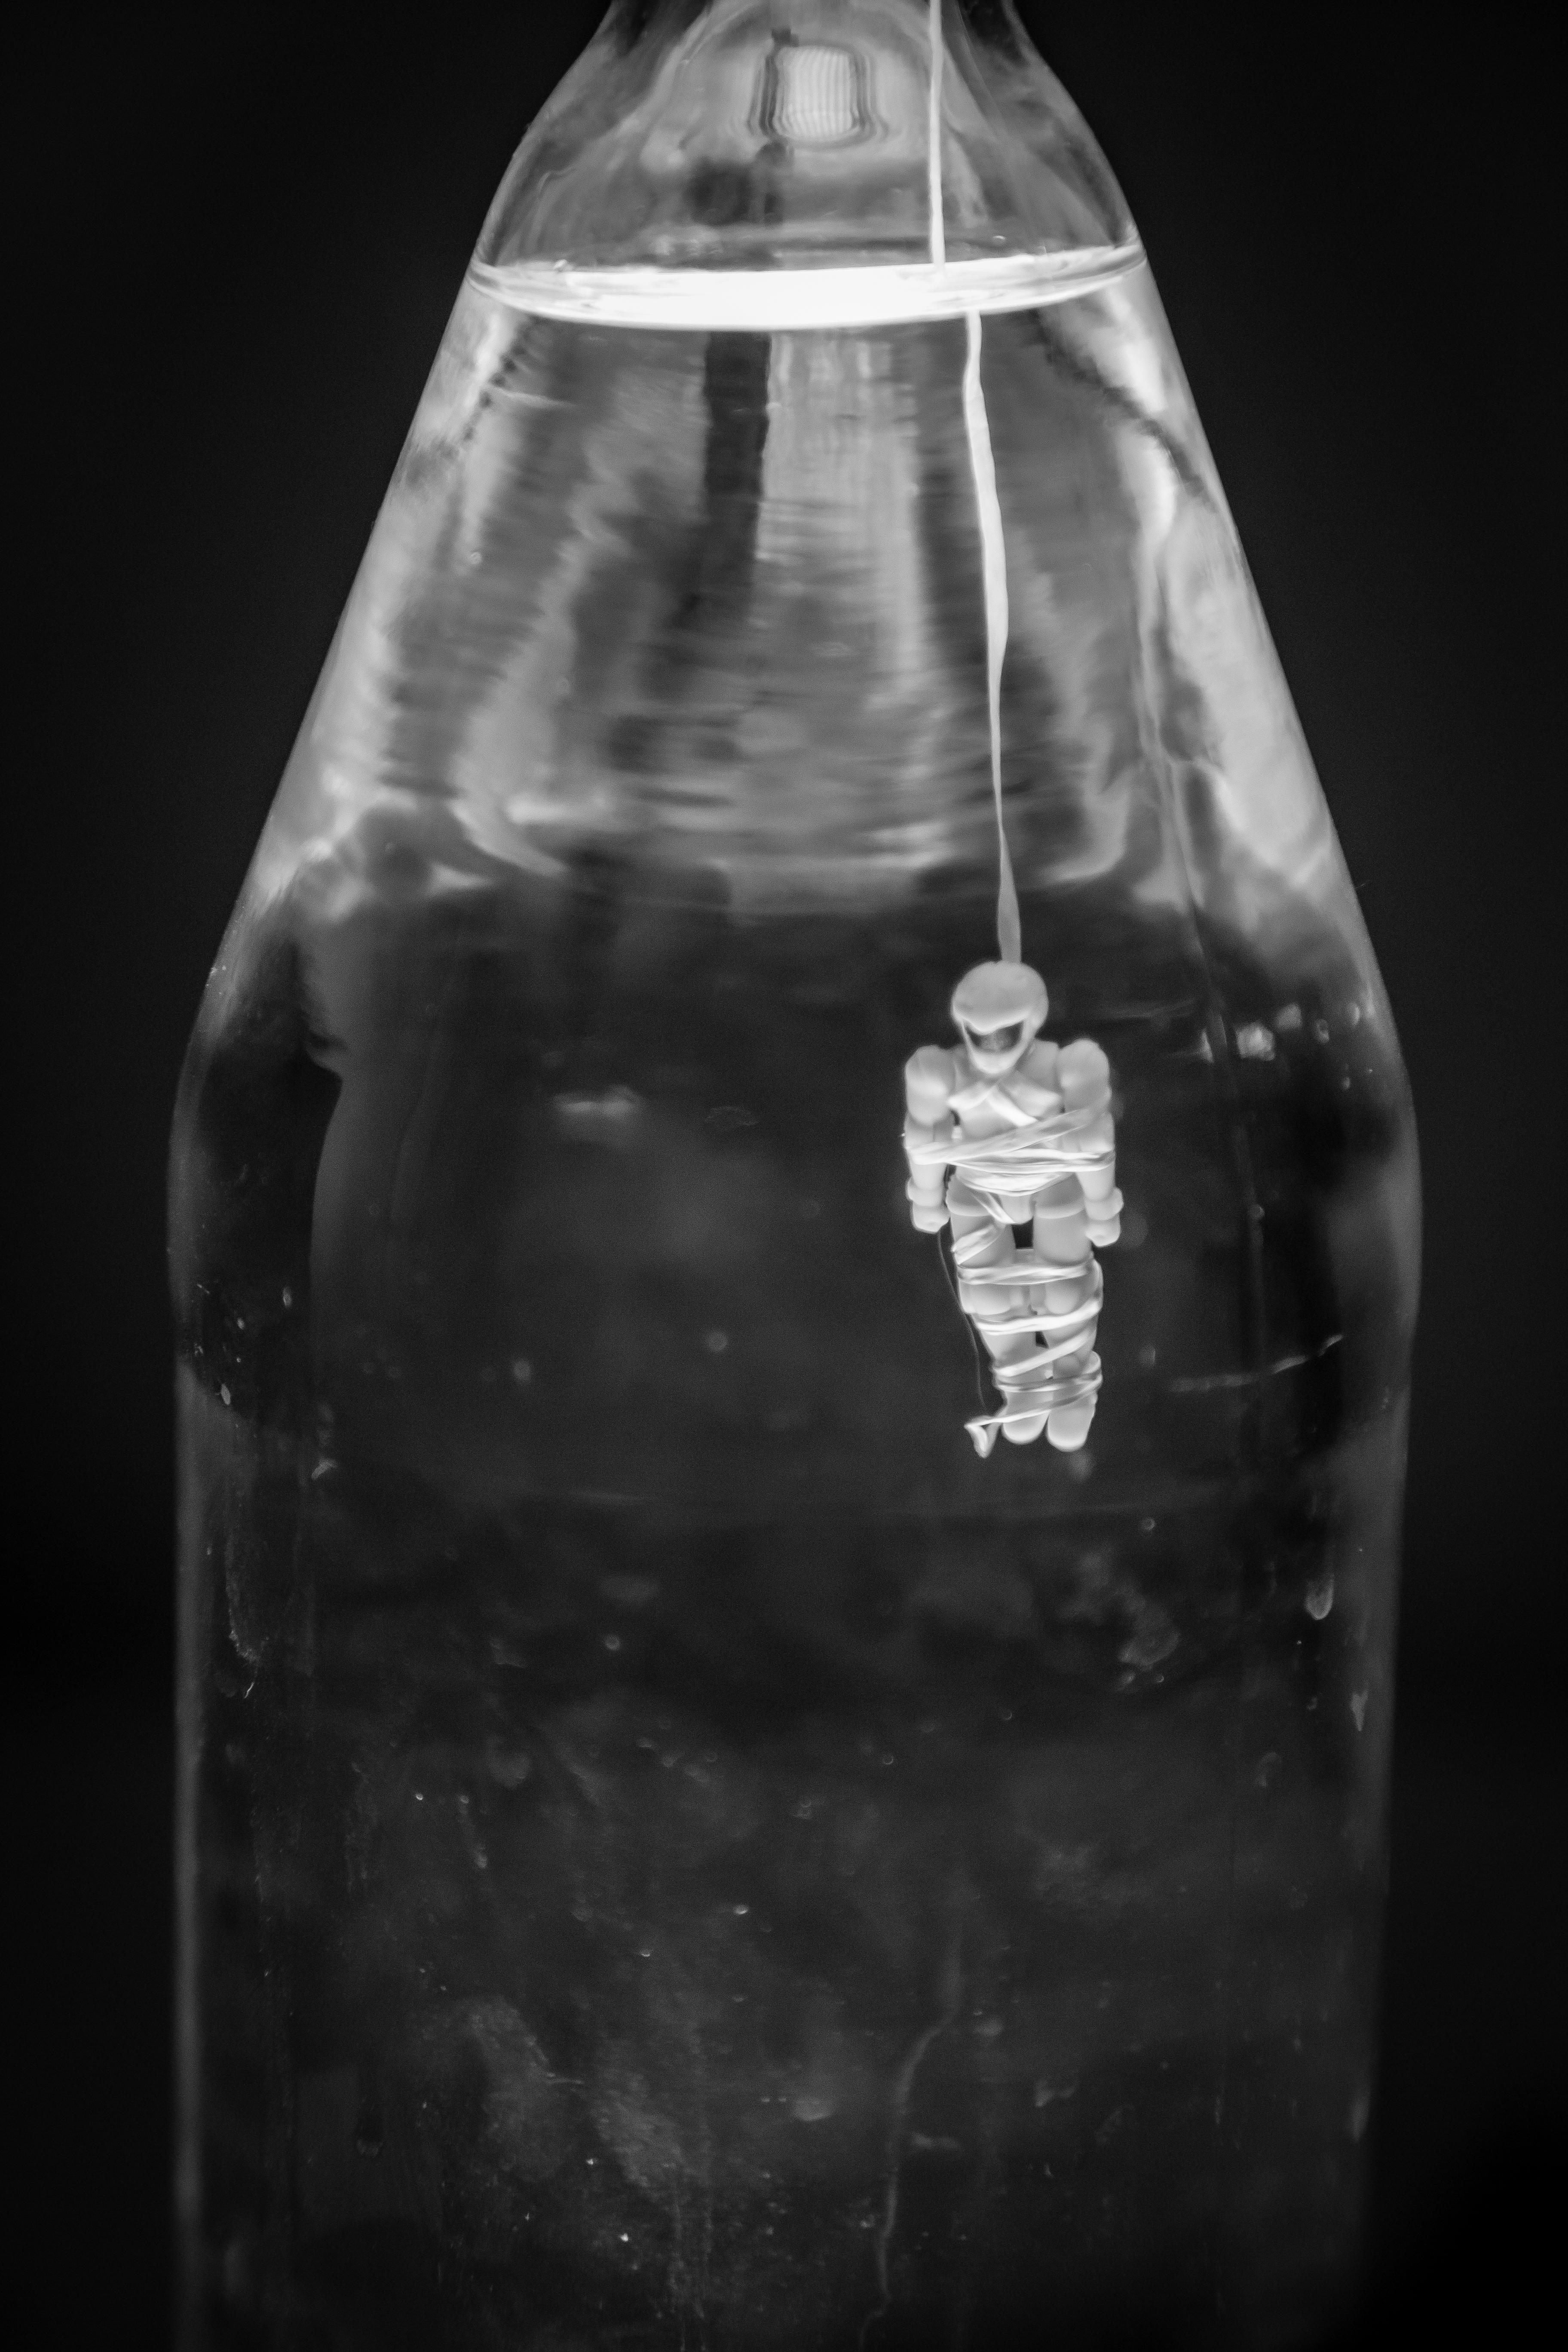 BottledHumanity-35